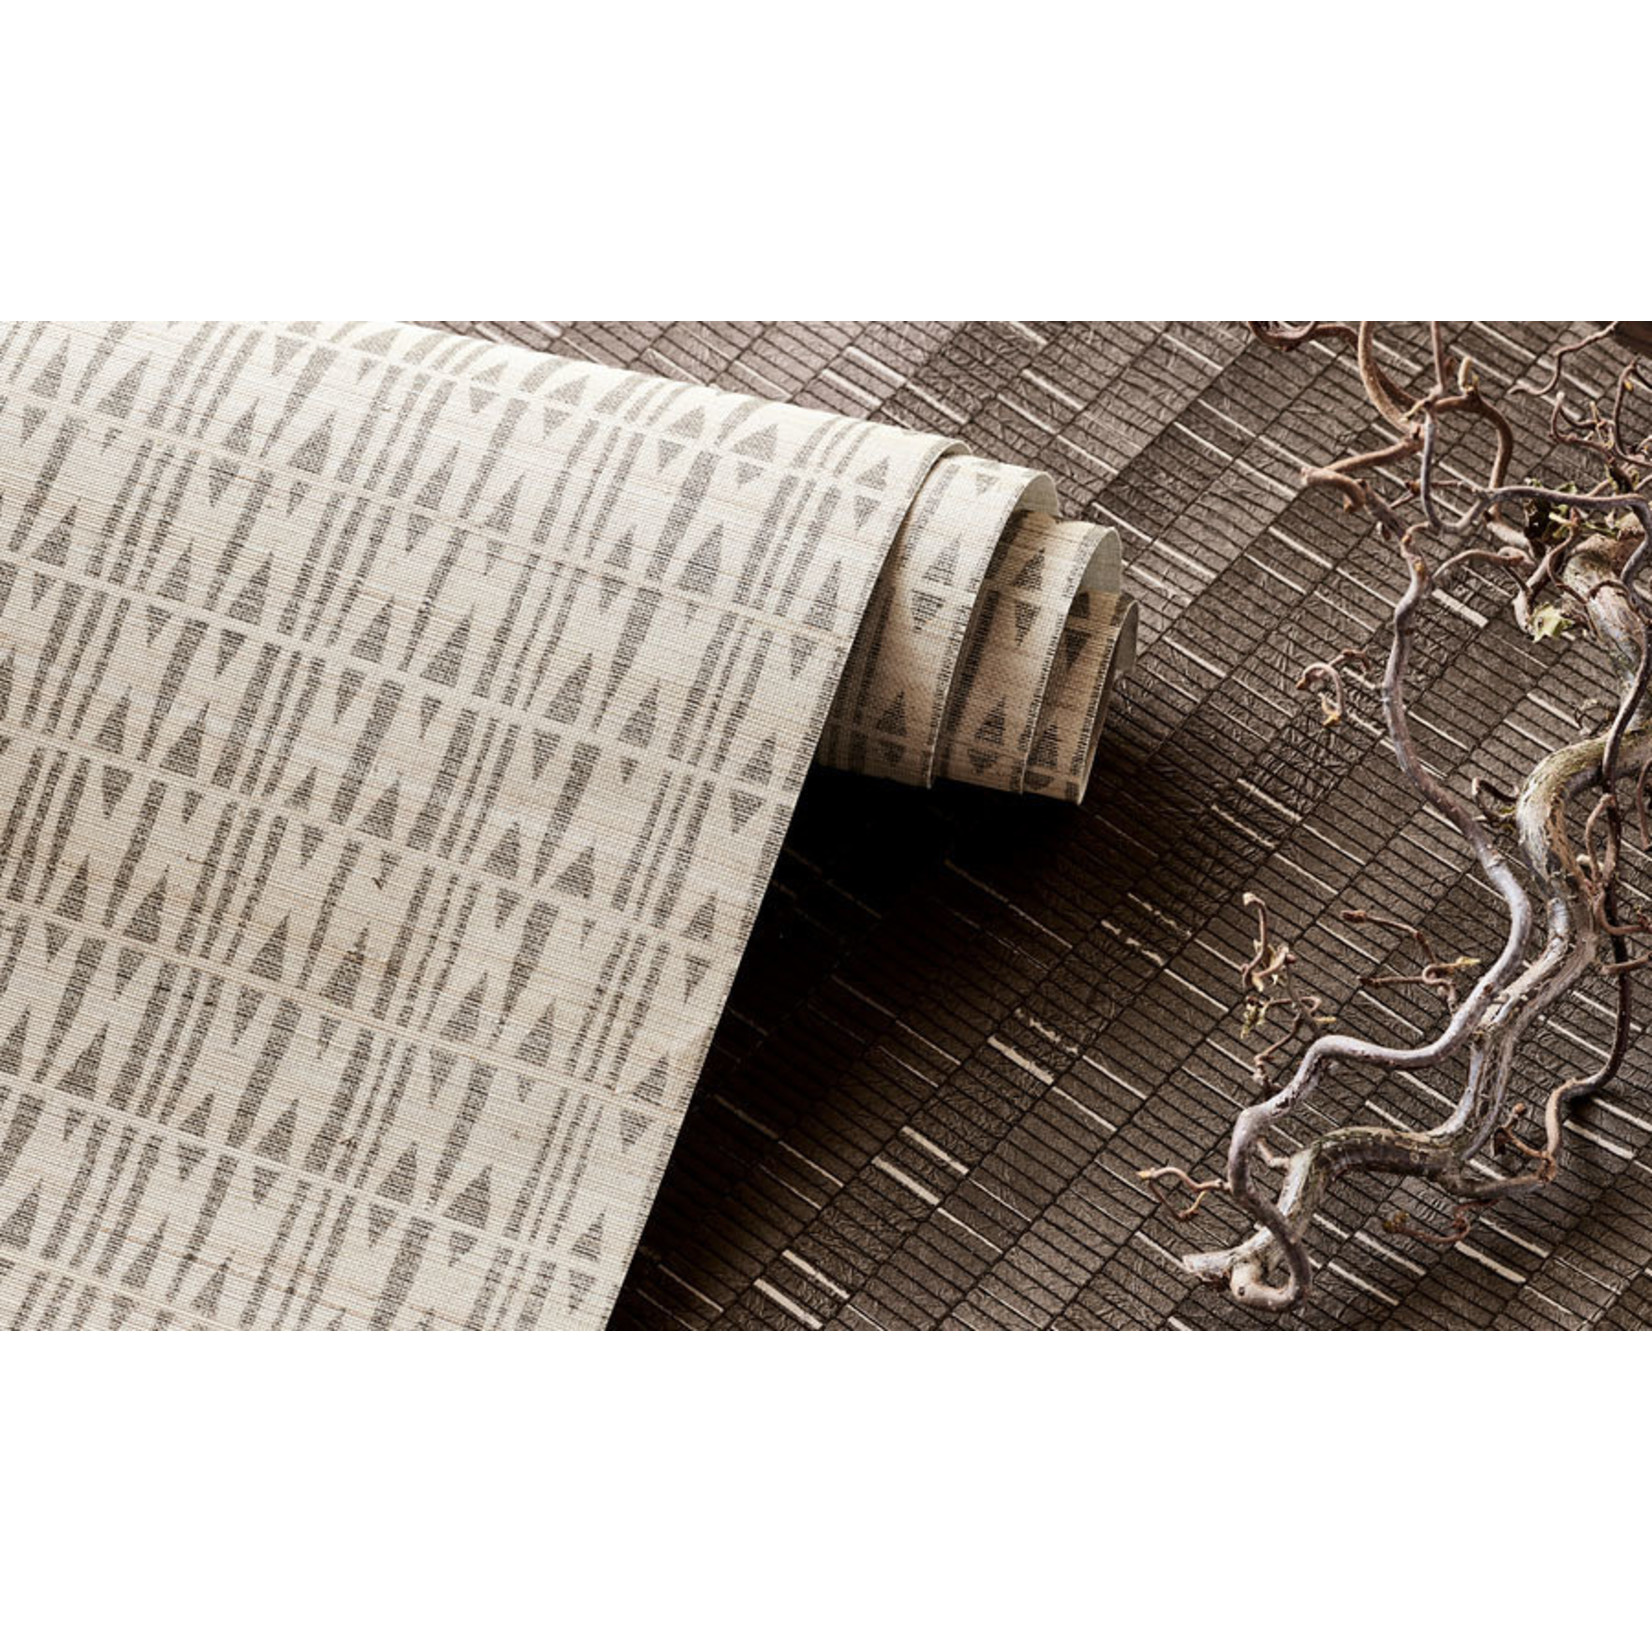 Mark Alexander Collage Handcrafted Wallcoverings   Tipi Indigo